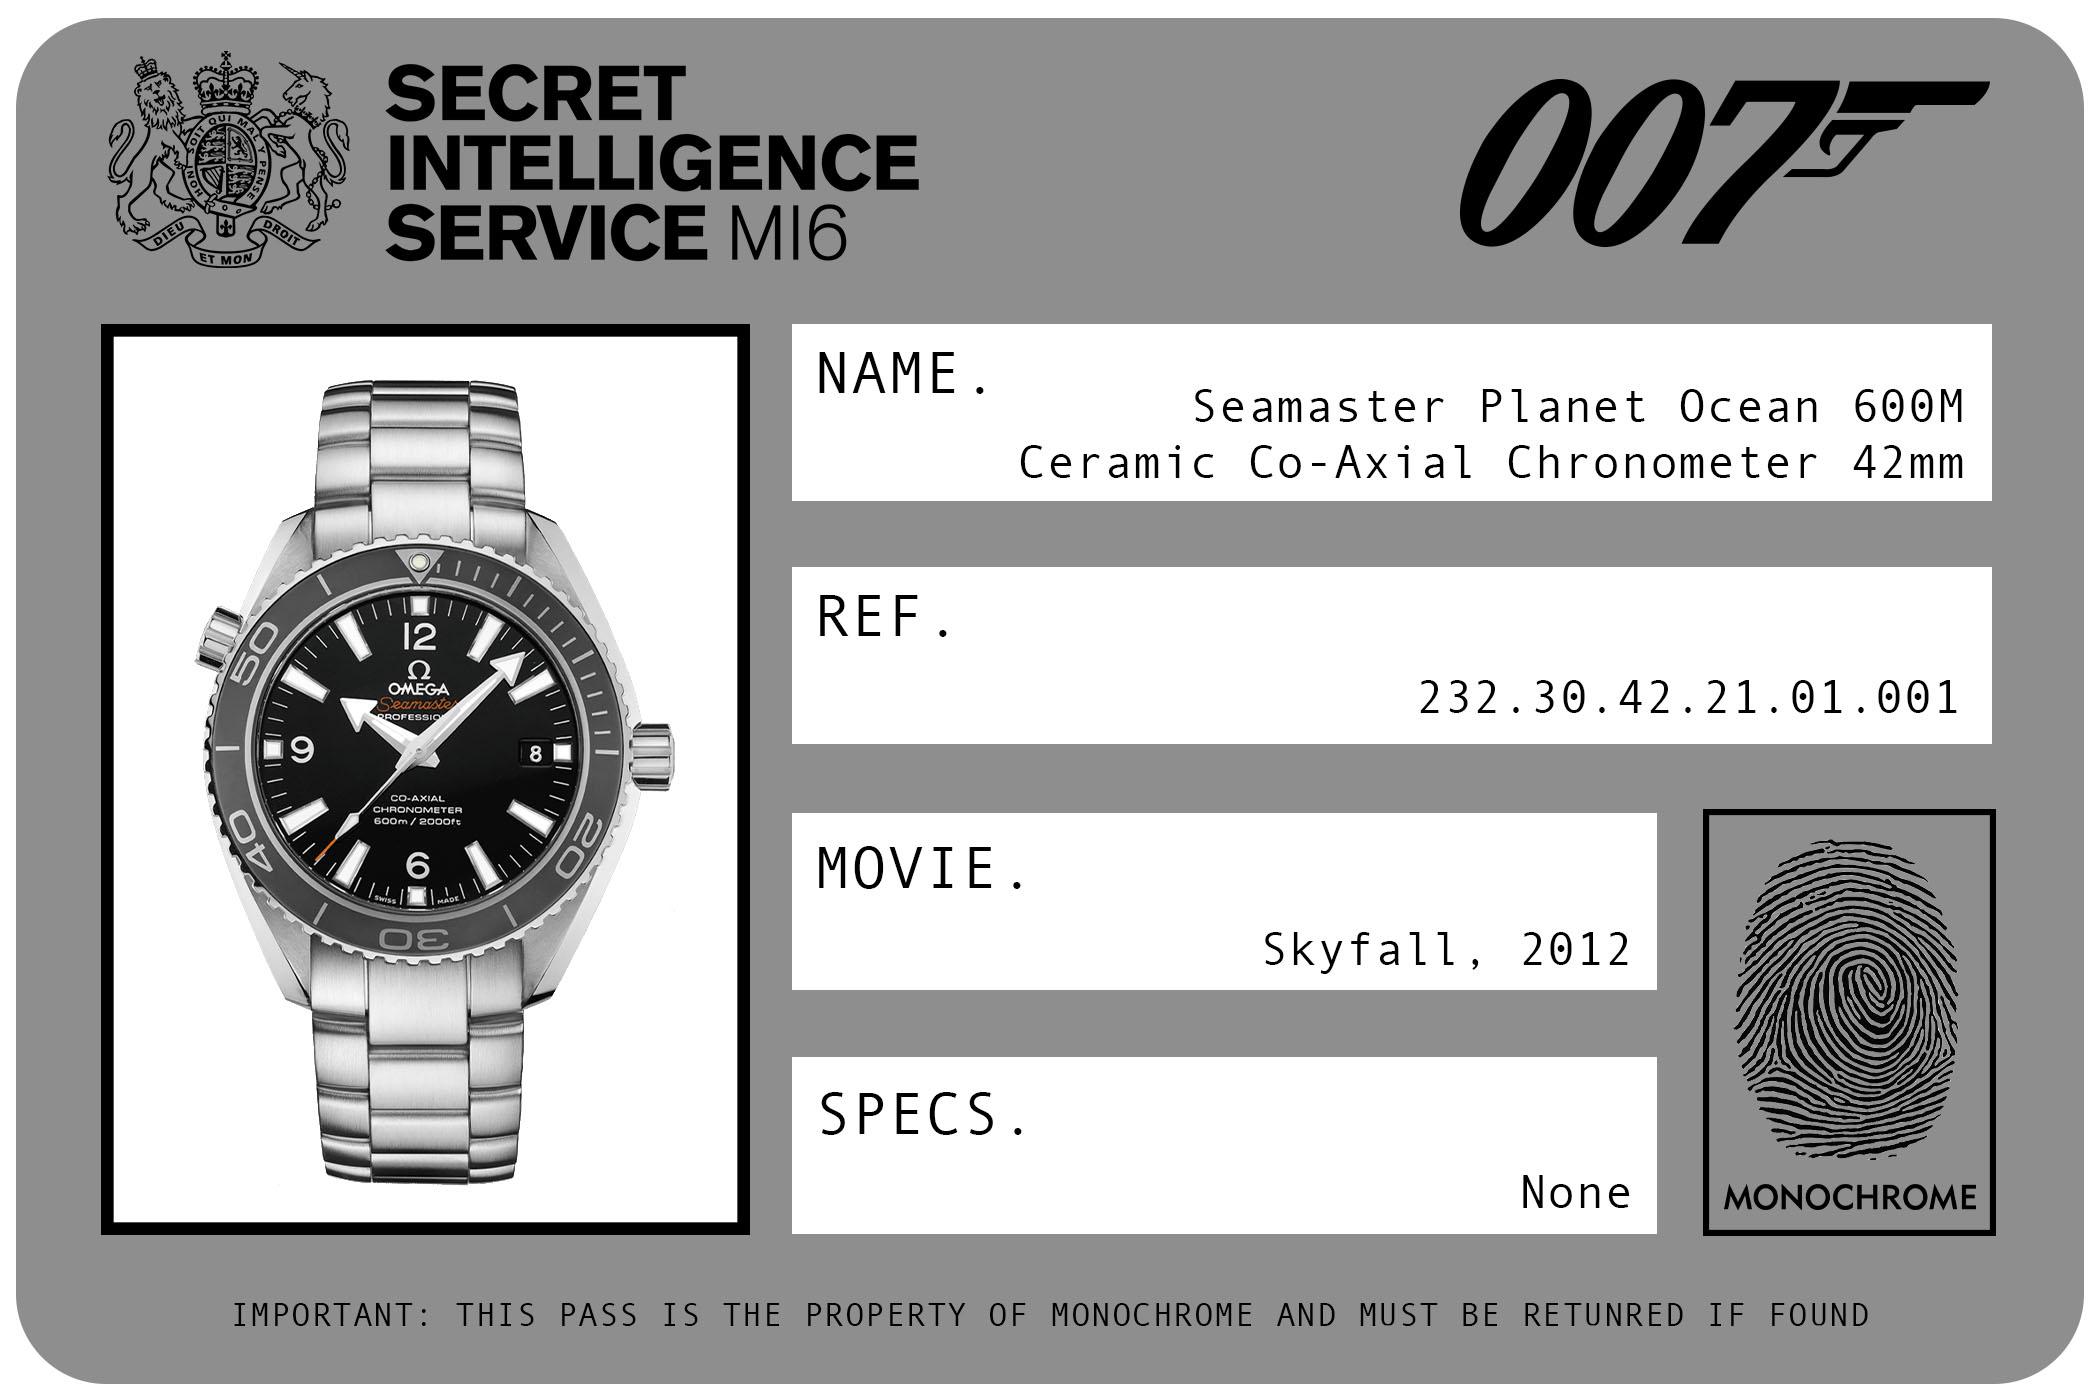 2012 - Omega Seamaster Planet Ocean 600M Ceramic Co-Axial Chronometer 42mm 232.30.42.21.01.001 James Bond Skyfall ID Card